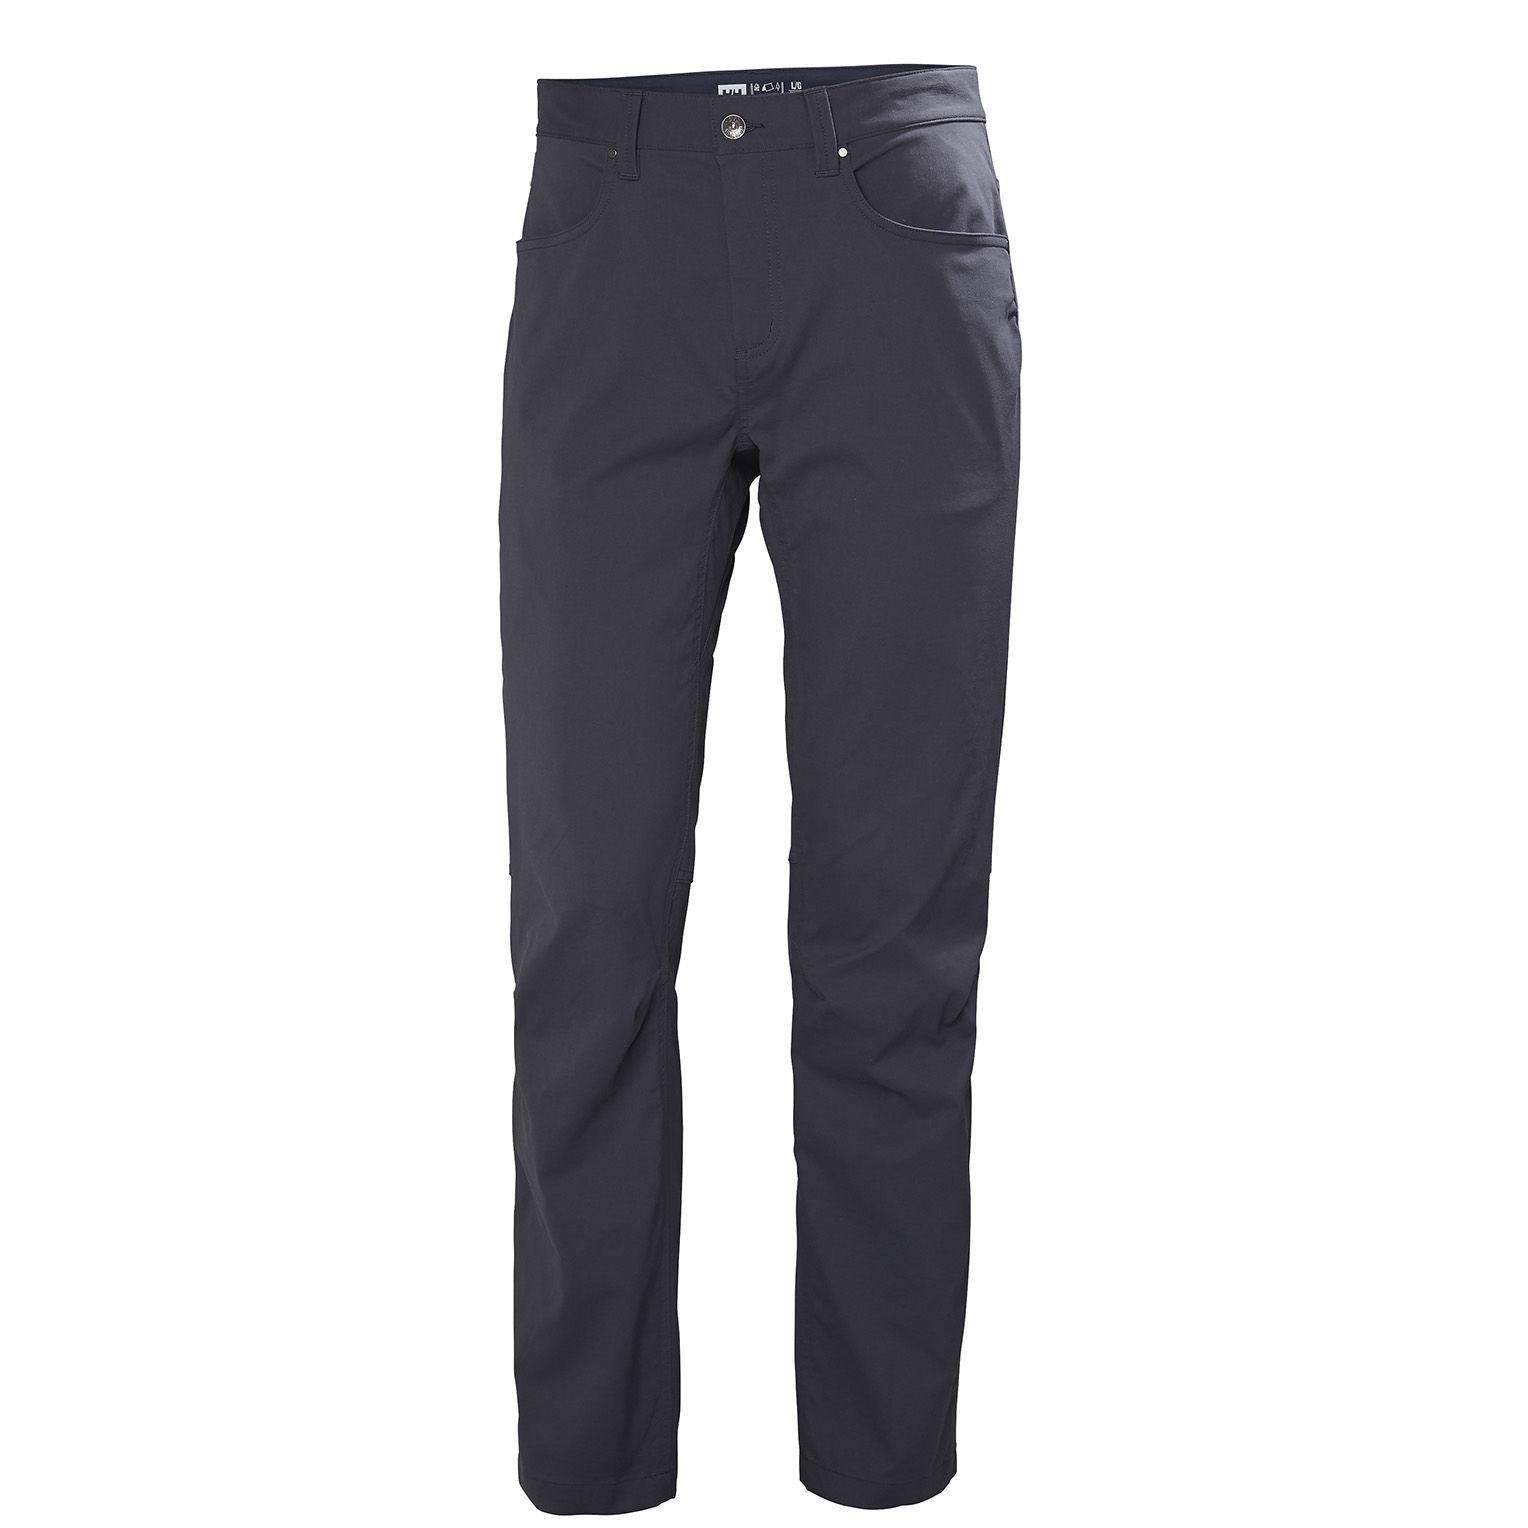 Braasport Helly Hansen Holmen 5 Pocket Pant, bukse herre